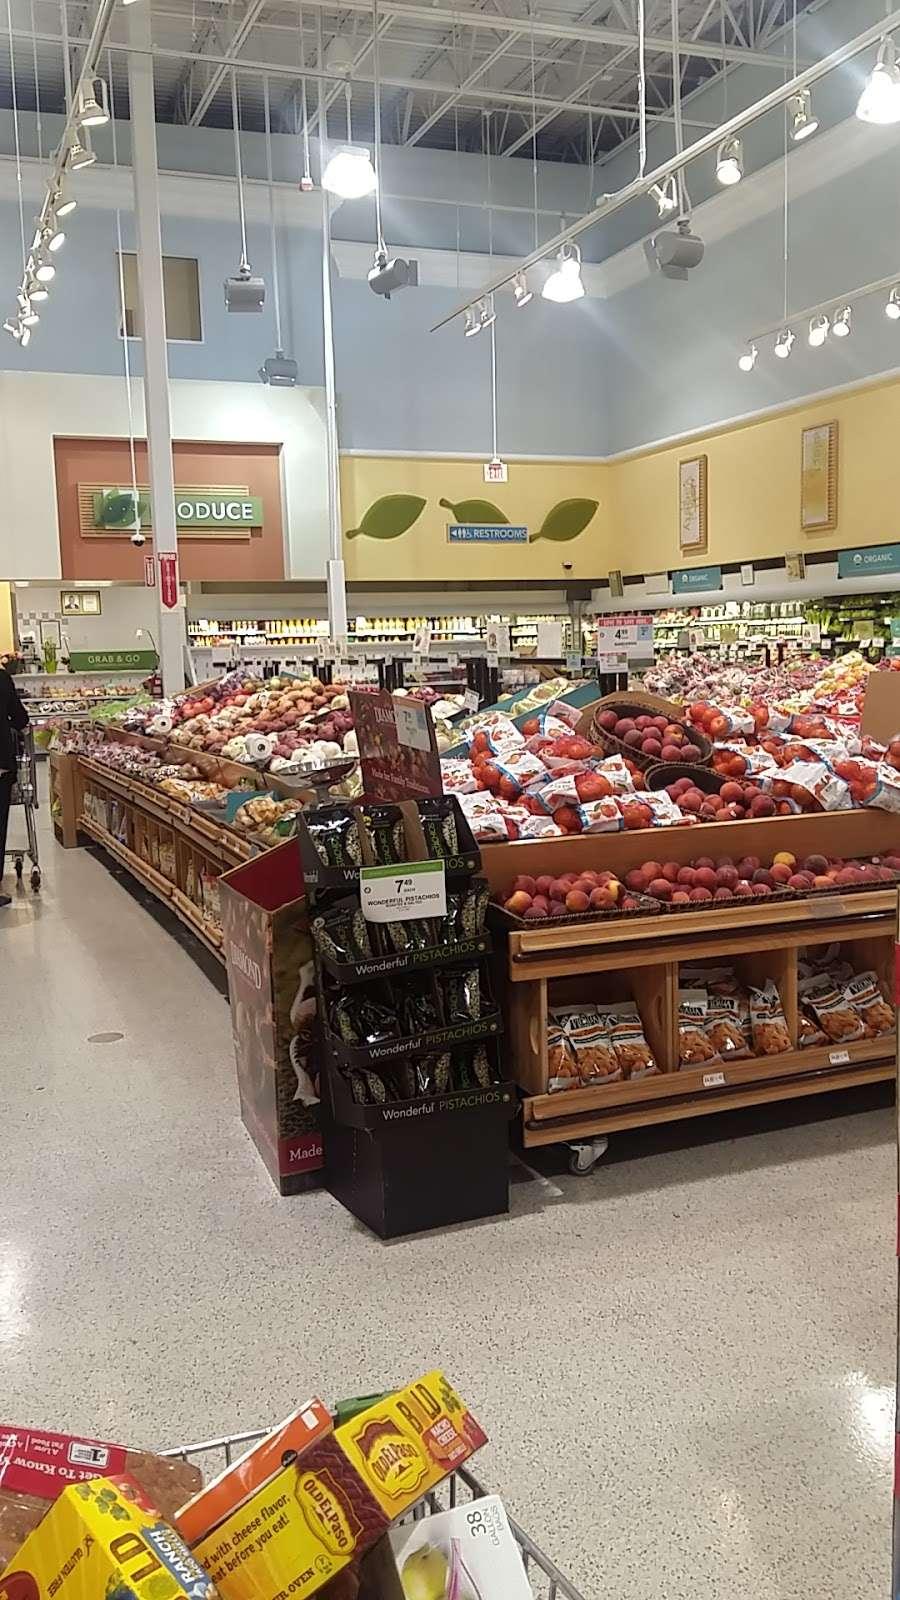 Publix Super Market at Veranda Shoppes - supermarket  | Photo 9 of 10 | Address: 550 N Pine Island Rd, Plantation, FL 33324, USA | Phone: (954) 475-5285